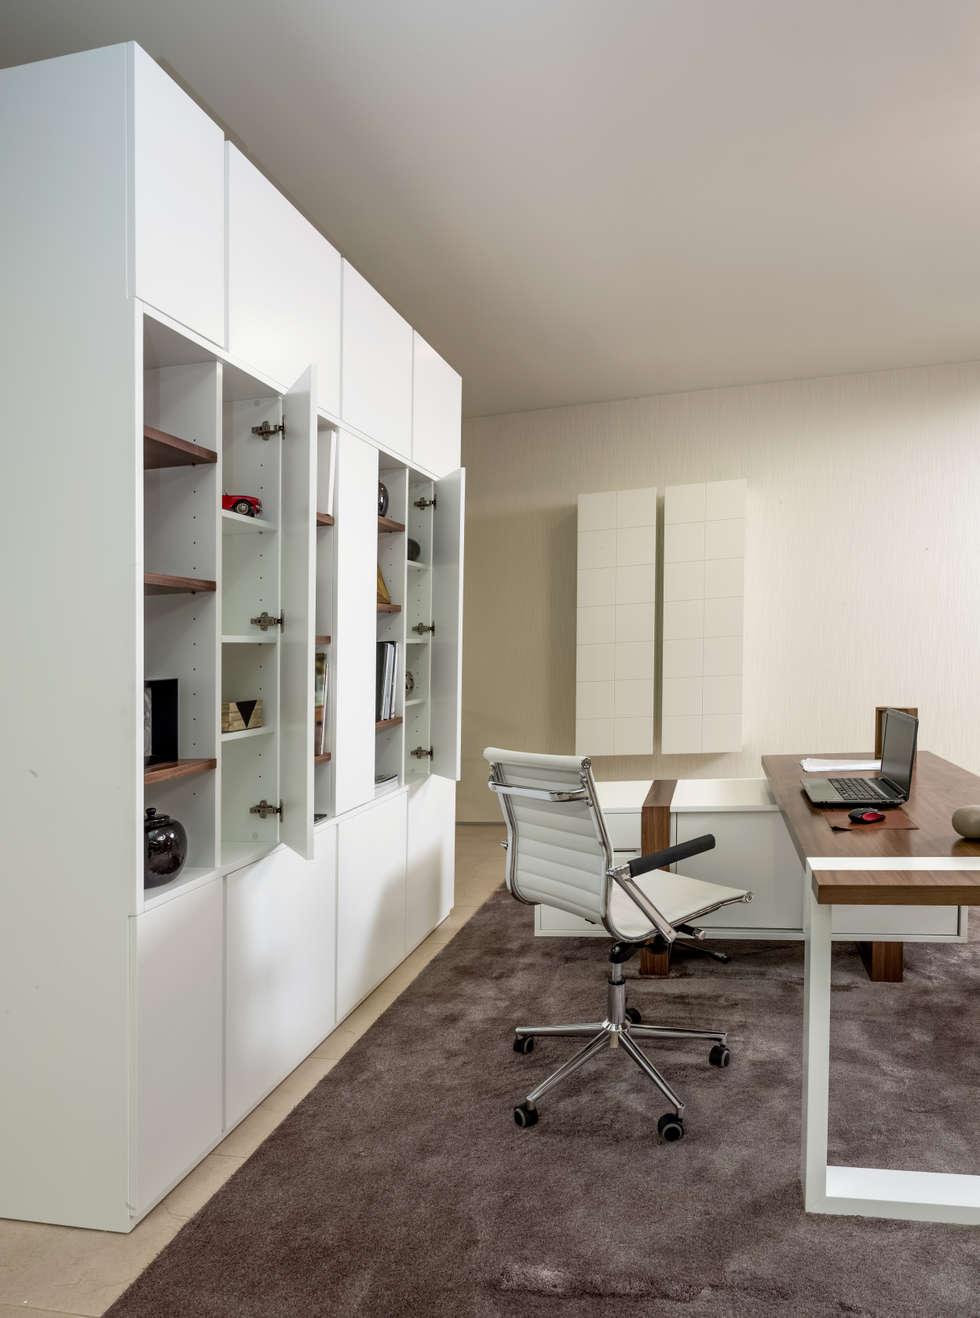 Design Kantoor Bureau.Interior Design Ideas Redecorating Remodeling Photos Homify